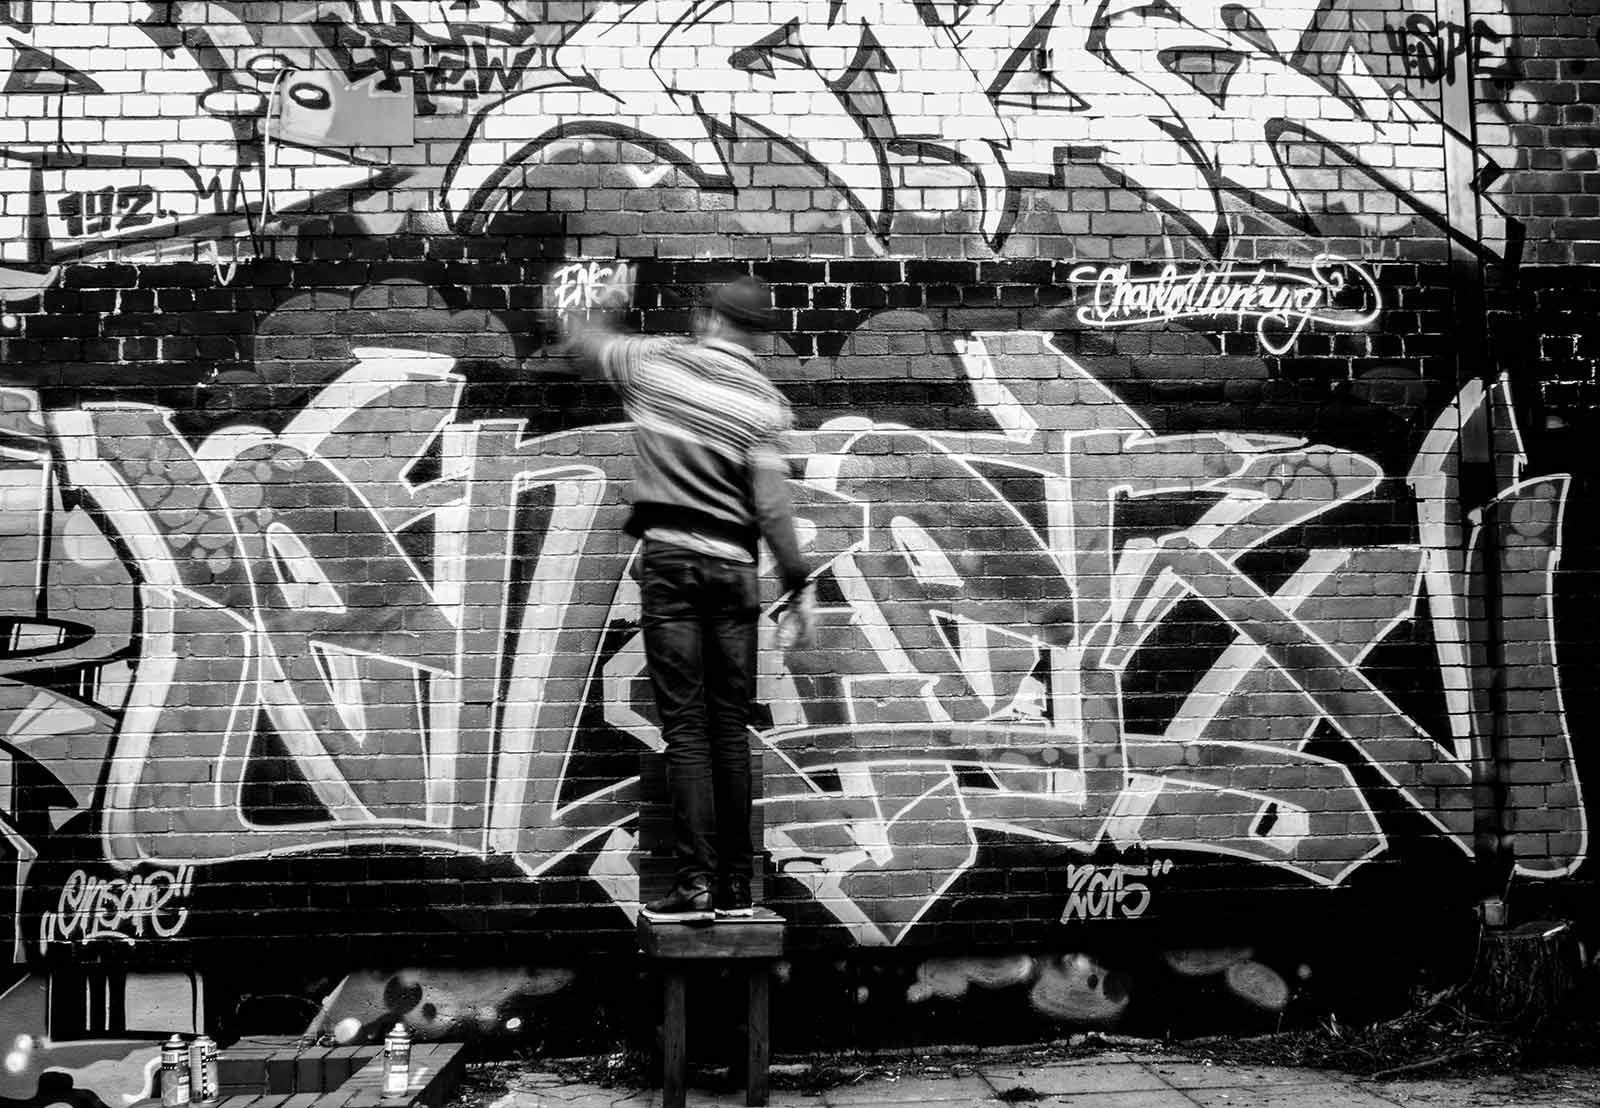 mullern berlins unsichtbare k nstler berlin graffiti. Black Bedroom Furniture Sets. Home Design Ideas